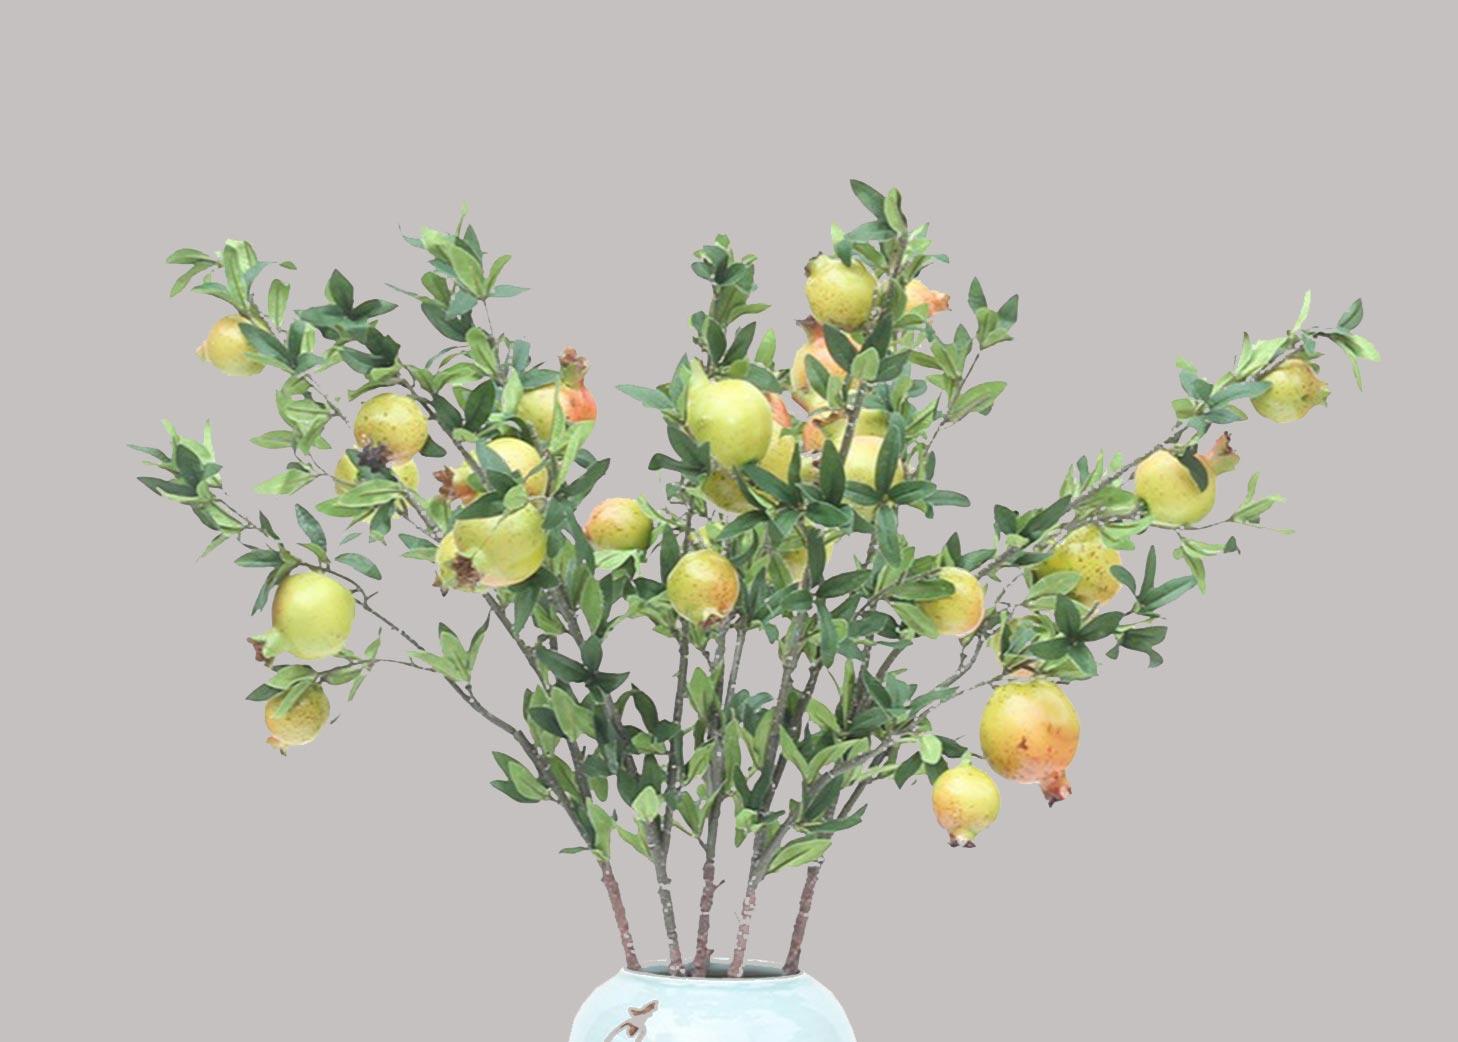 Pomegranate branches <br> กิ่งทับทิม <br> SKU: 11001 - Green